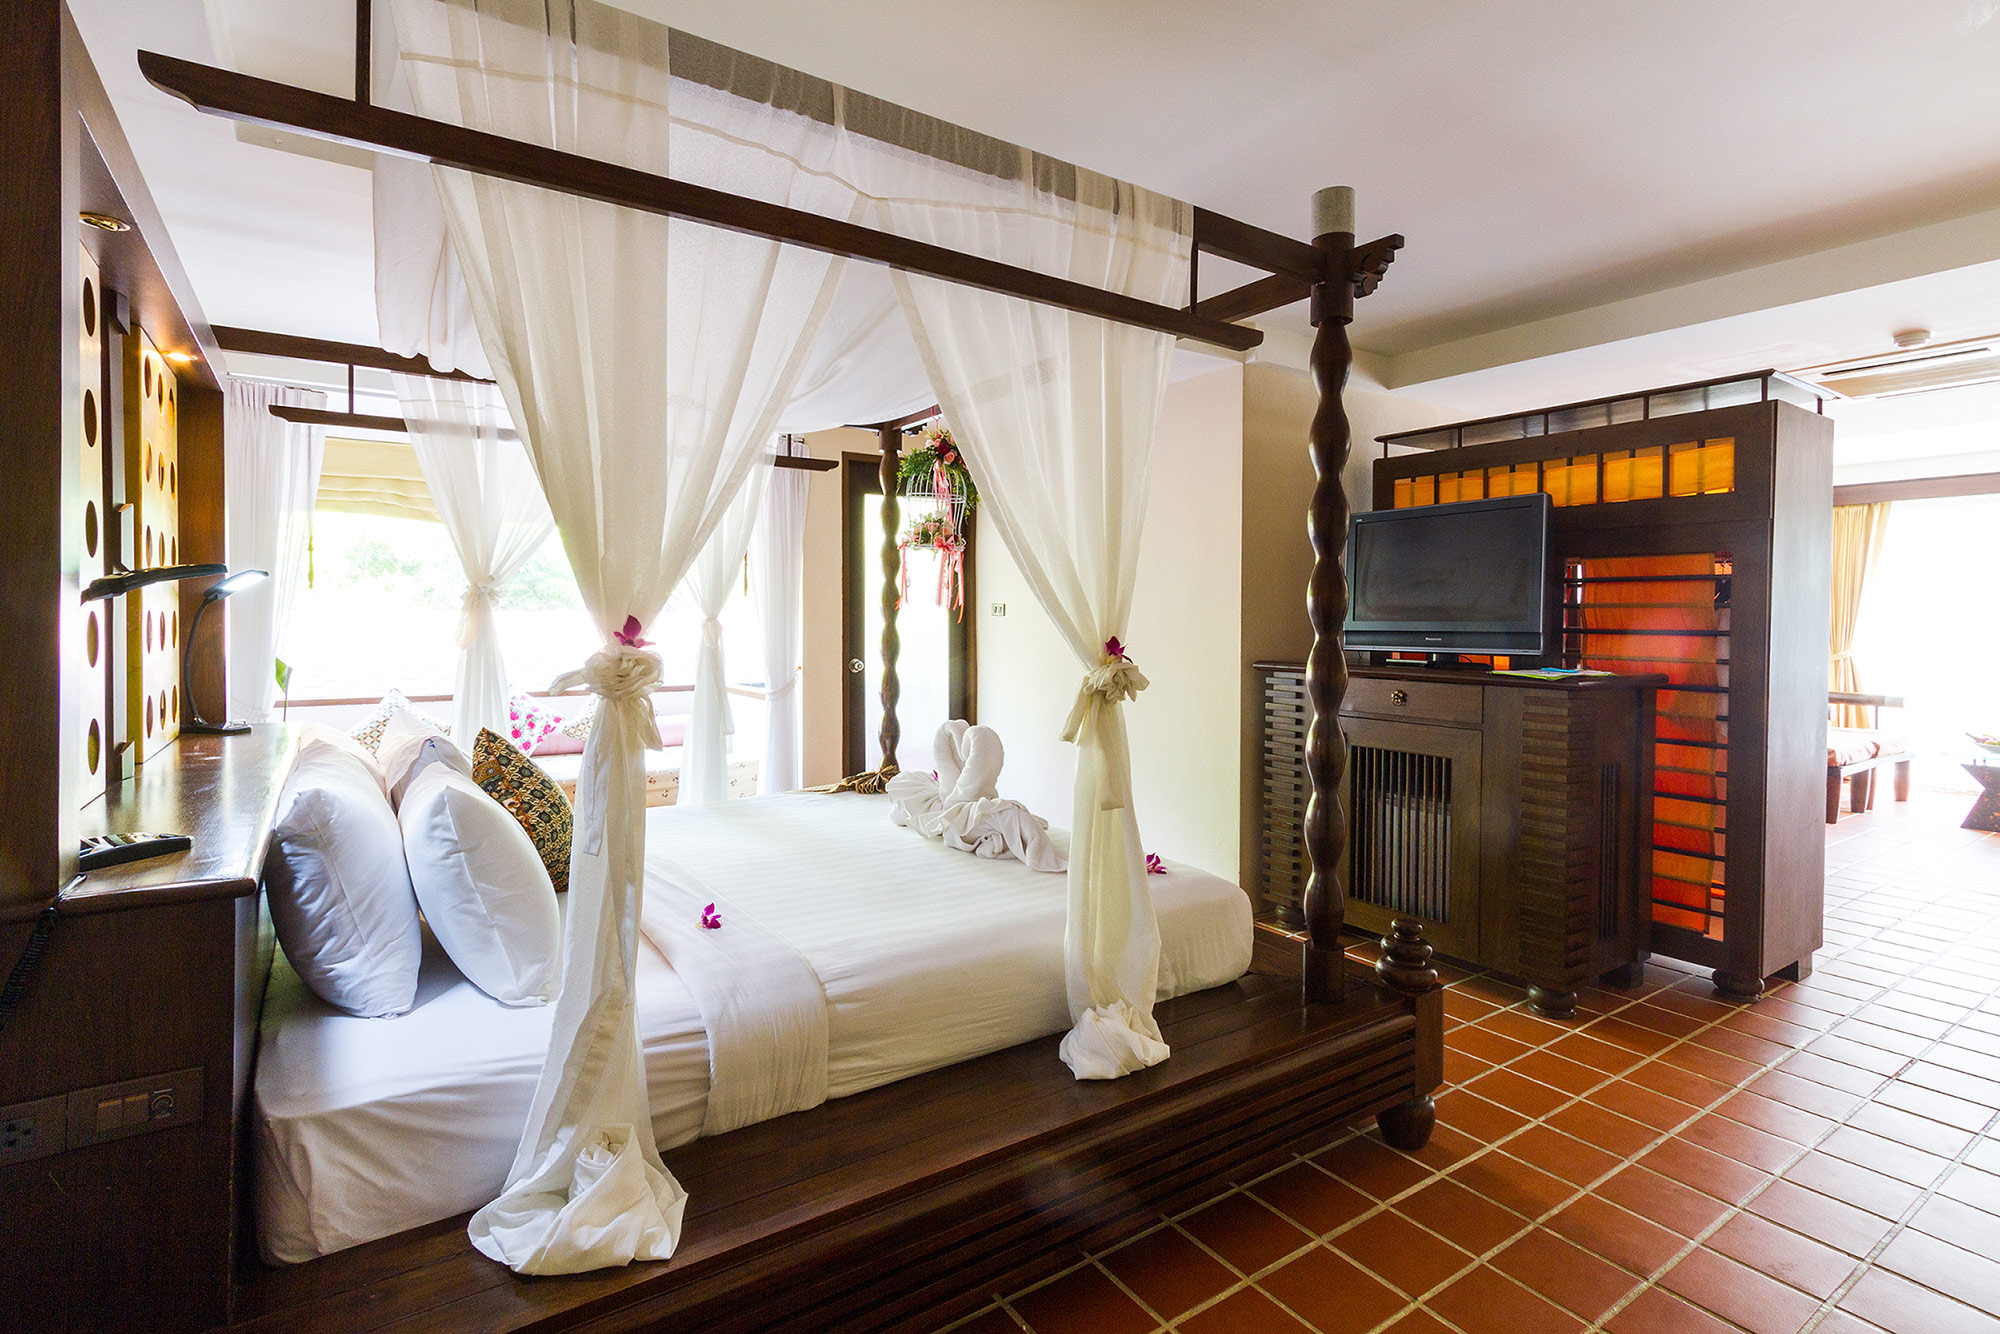 Aonang Princeville Resort and Spa  อ่าวนาง ปริ๊นซ์วิลล์ รีสอร์ท แอนด์ สปา Aonang Princeville Resort IMG 0216